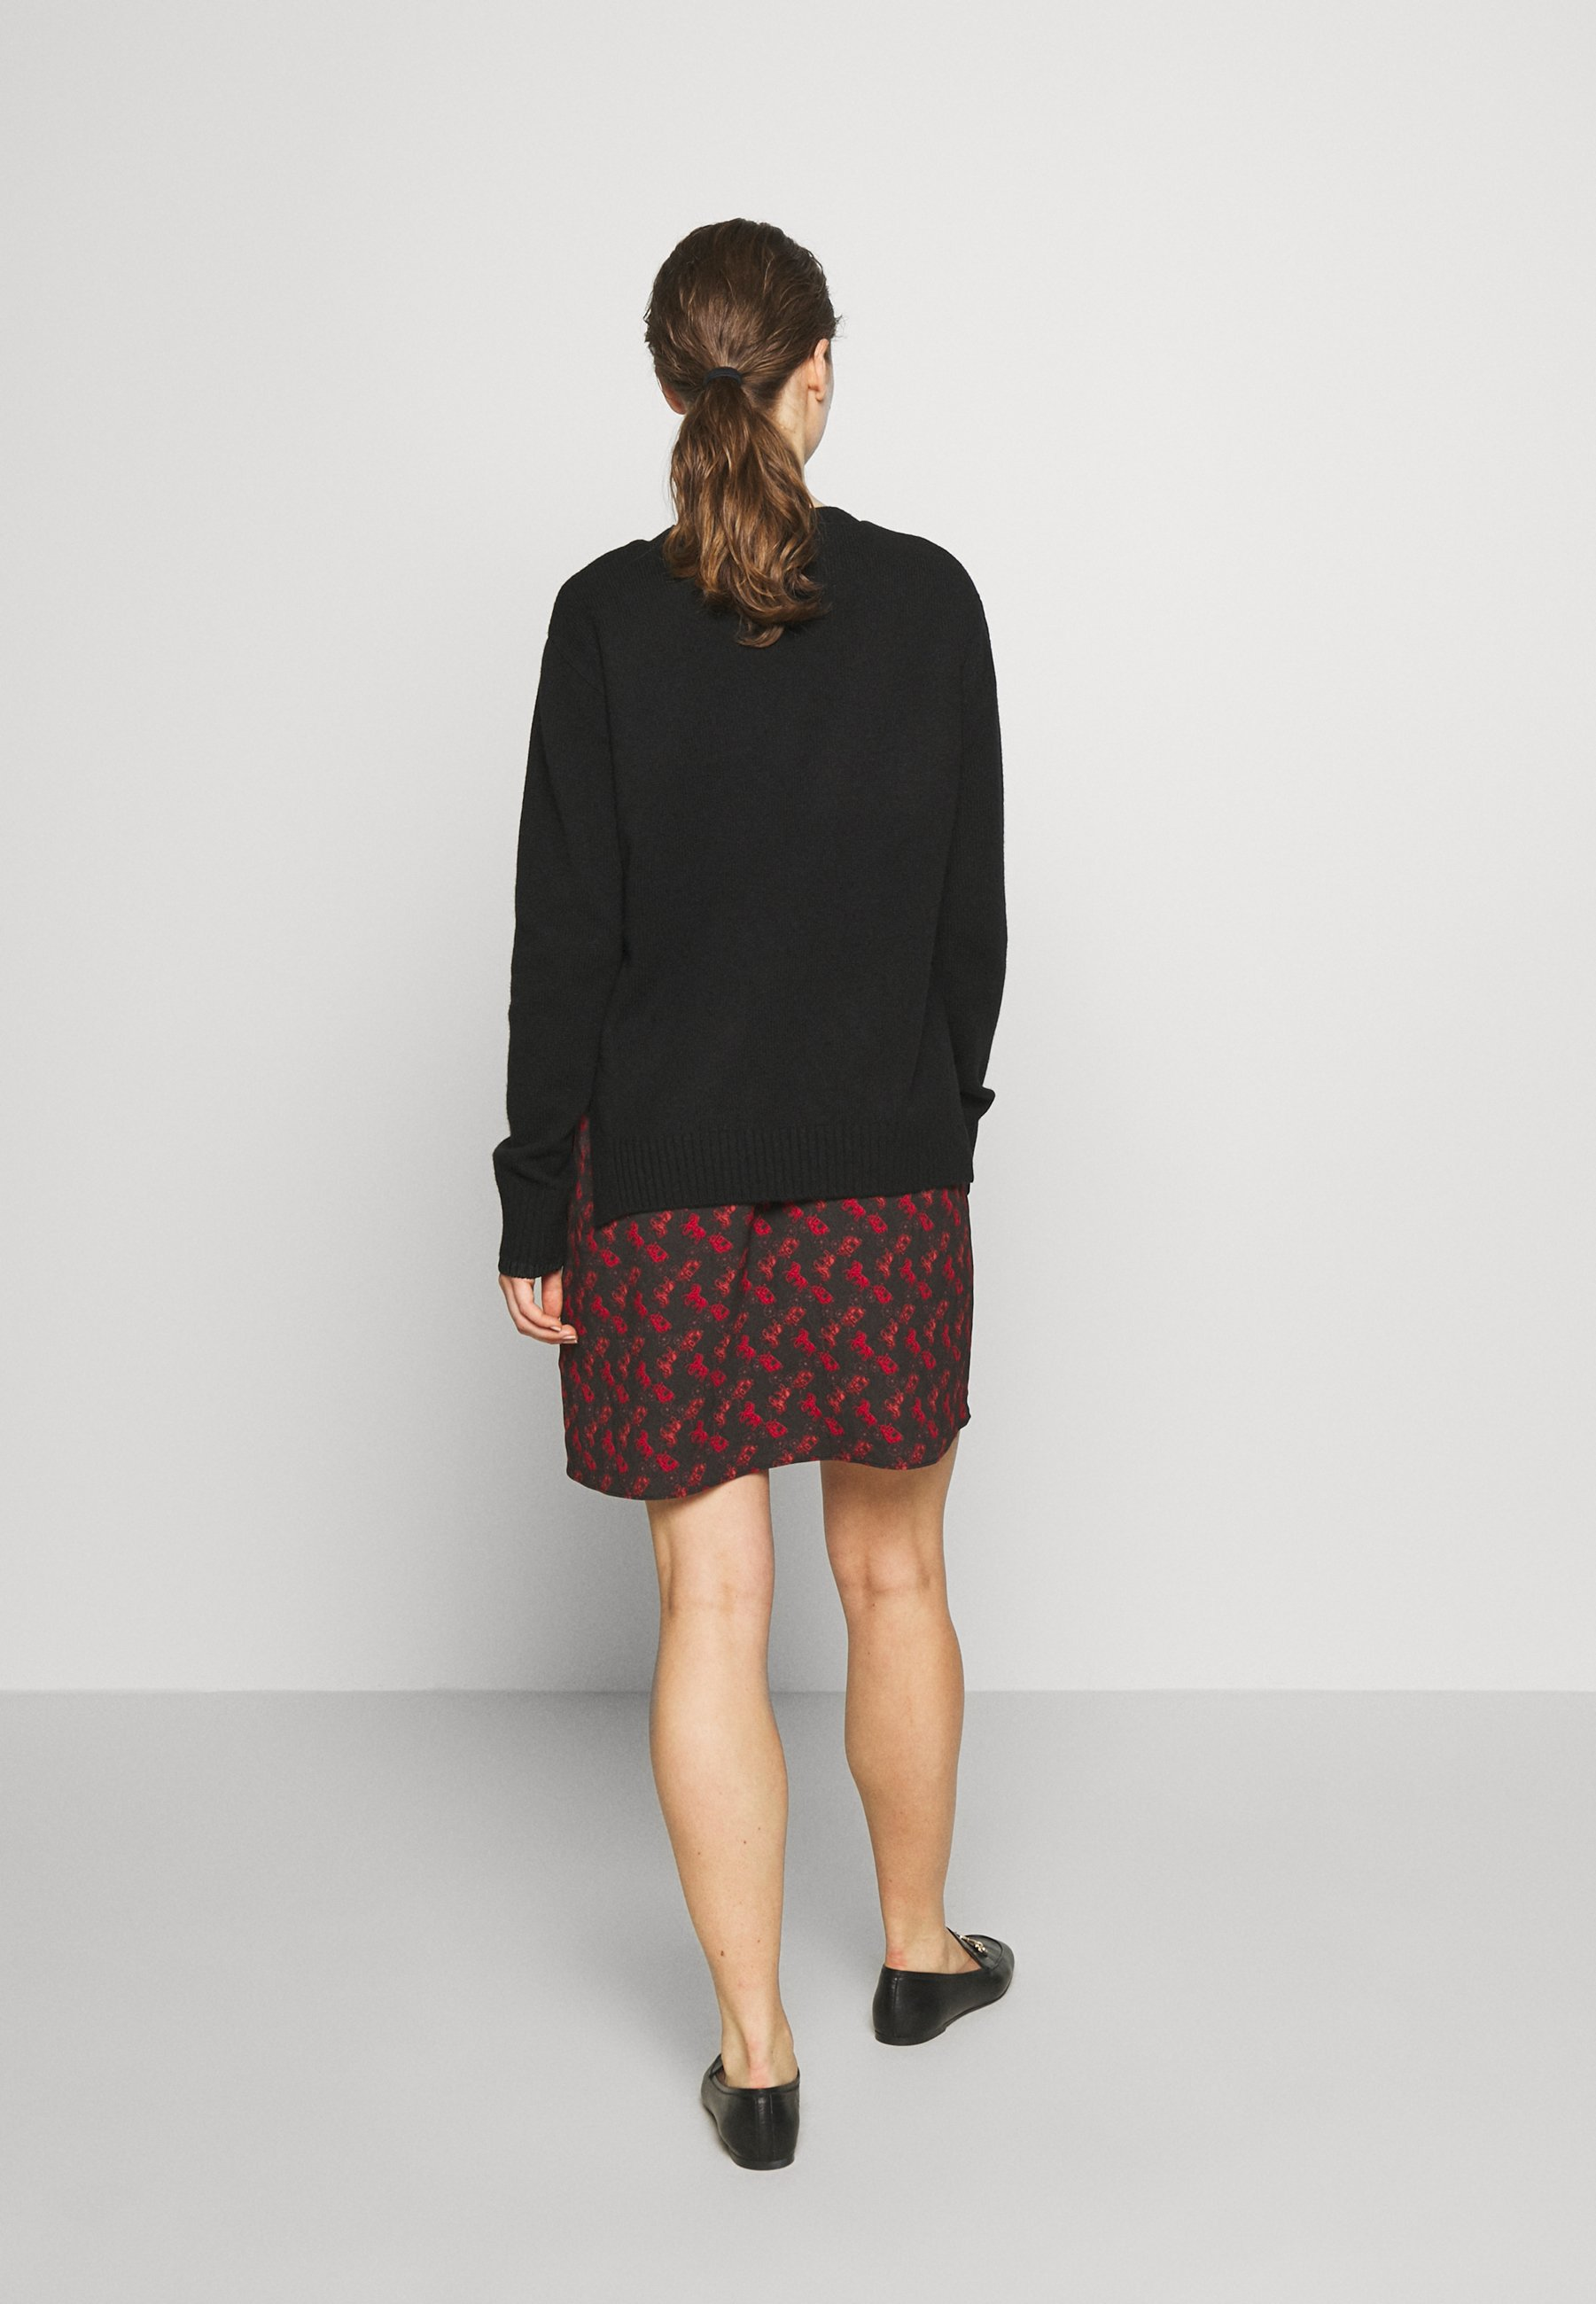 Coach Horse And Carriage Print Dress - Neulemekko Black